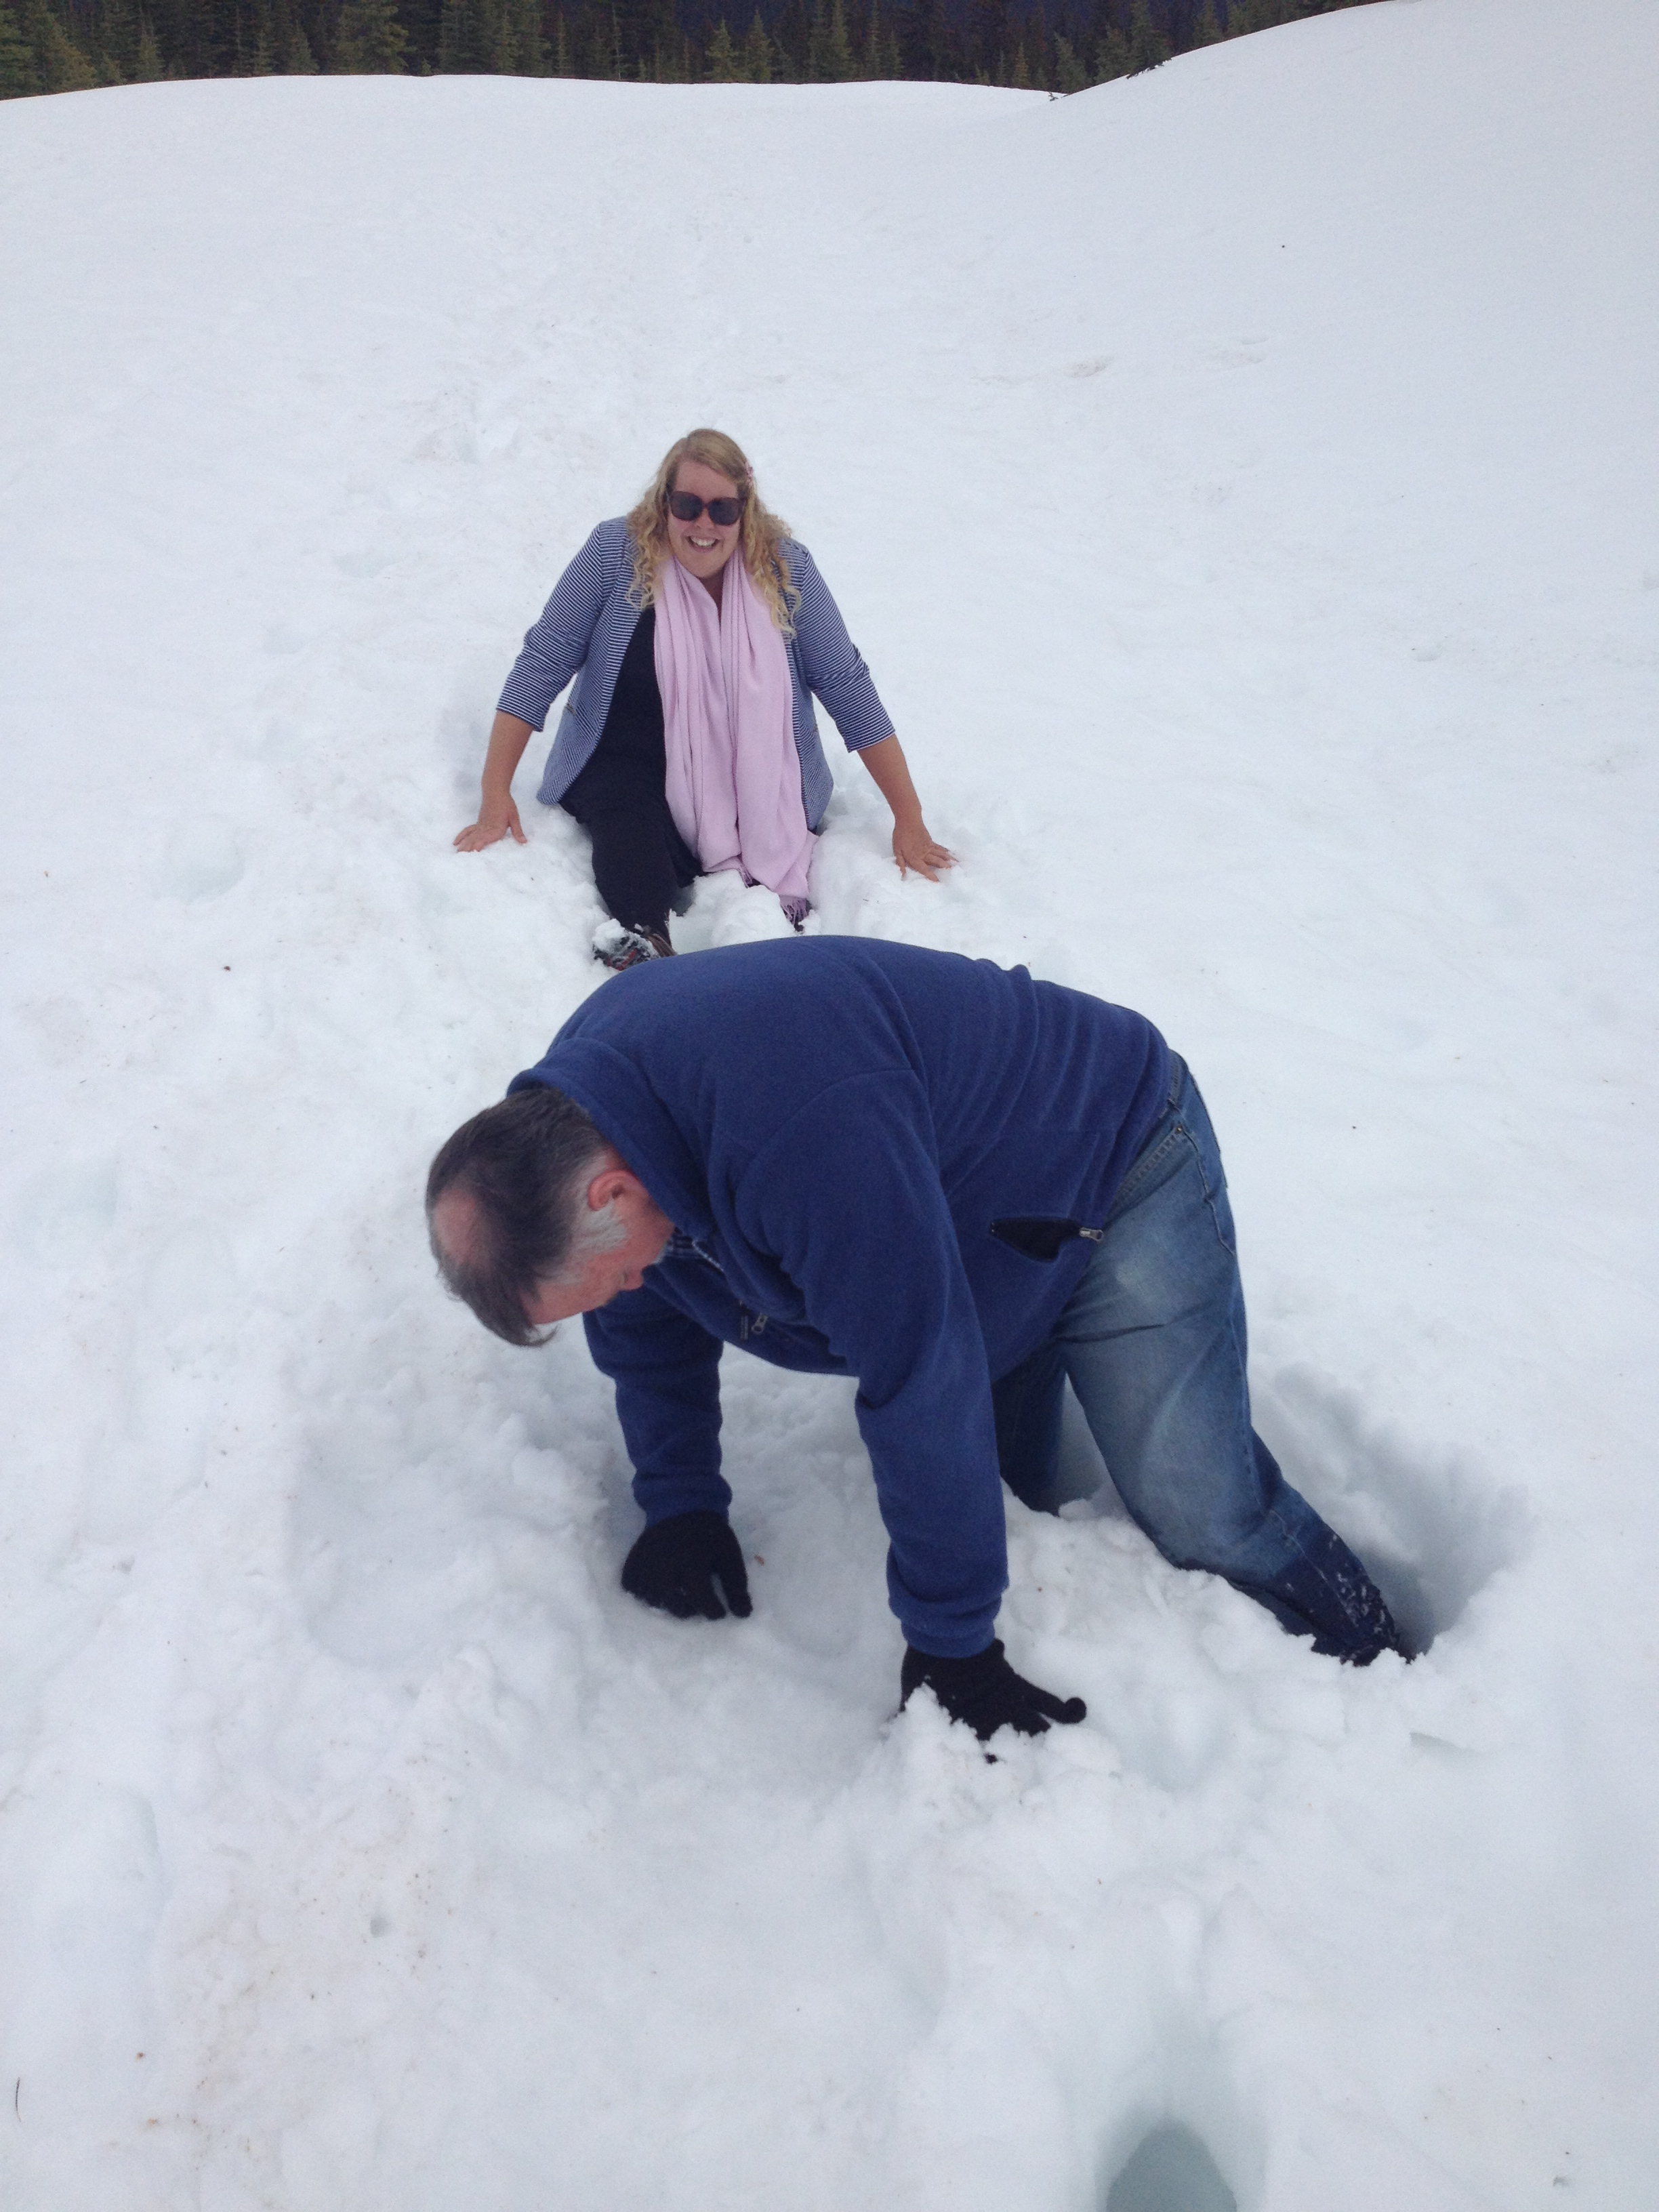 'Snow problem